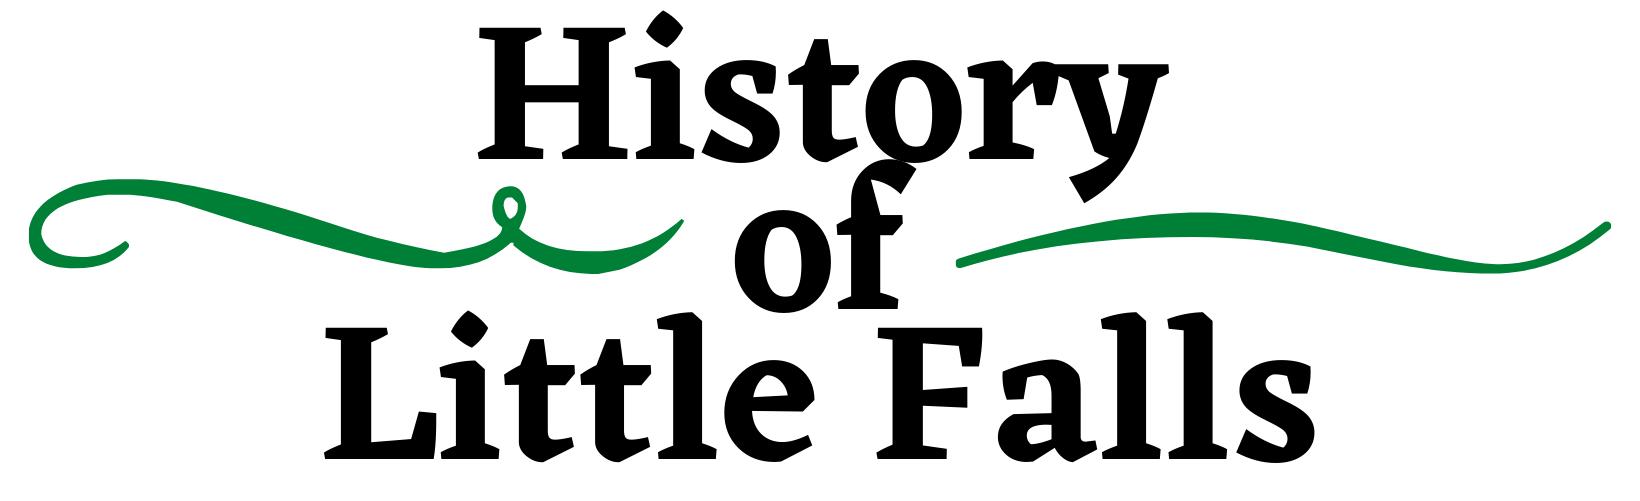 History of Little Falls banner